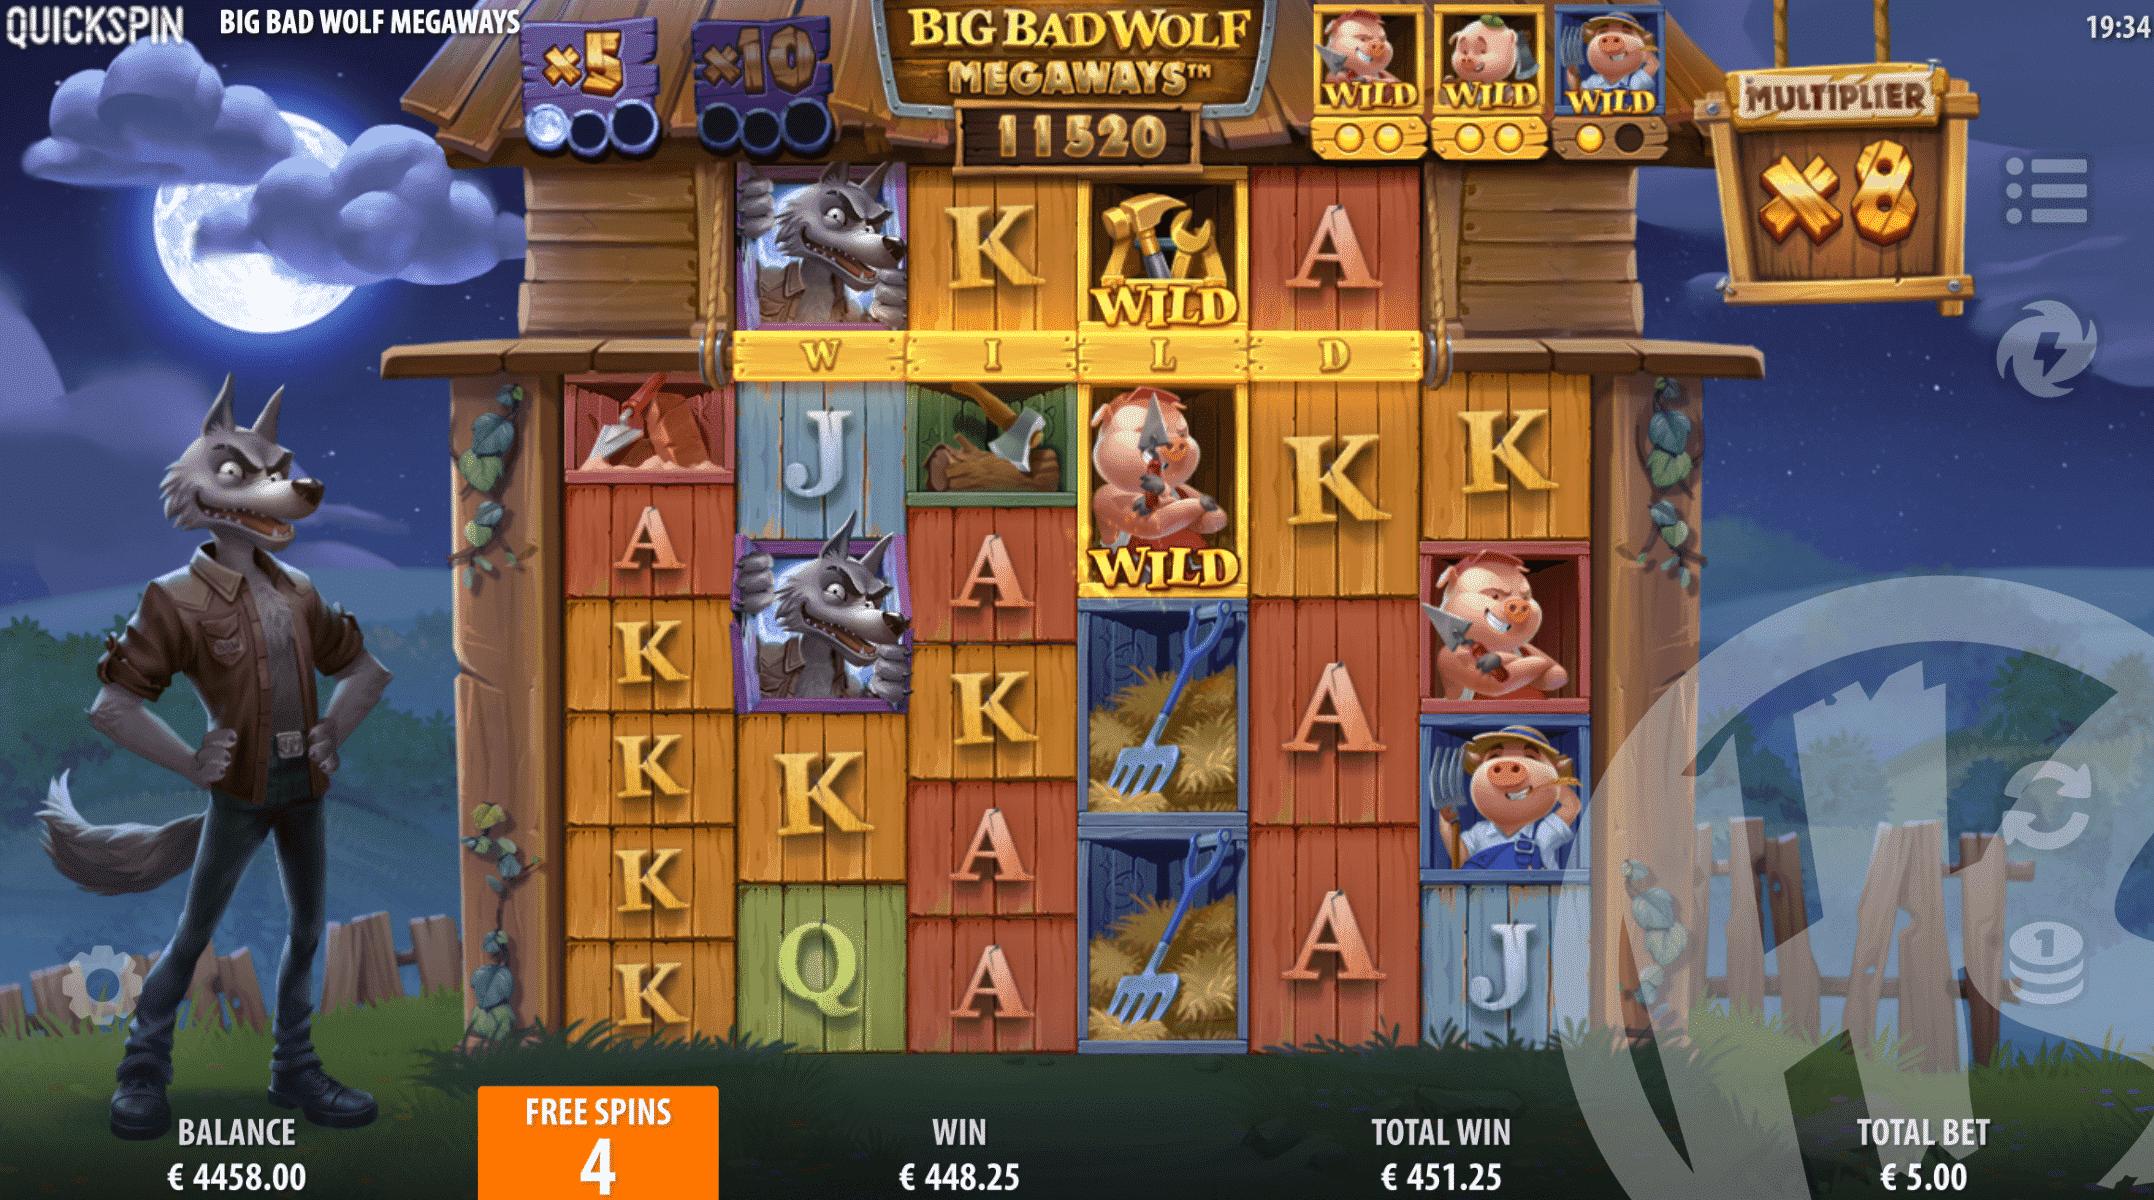 Big Bad Wolf Megaways Free Spins